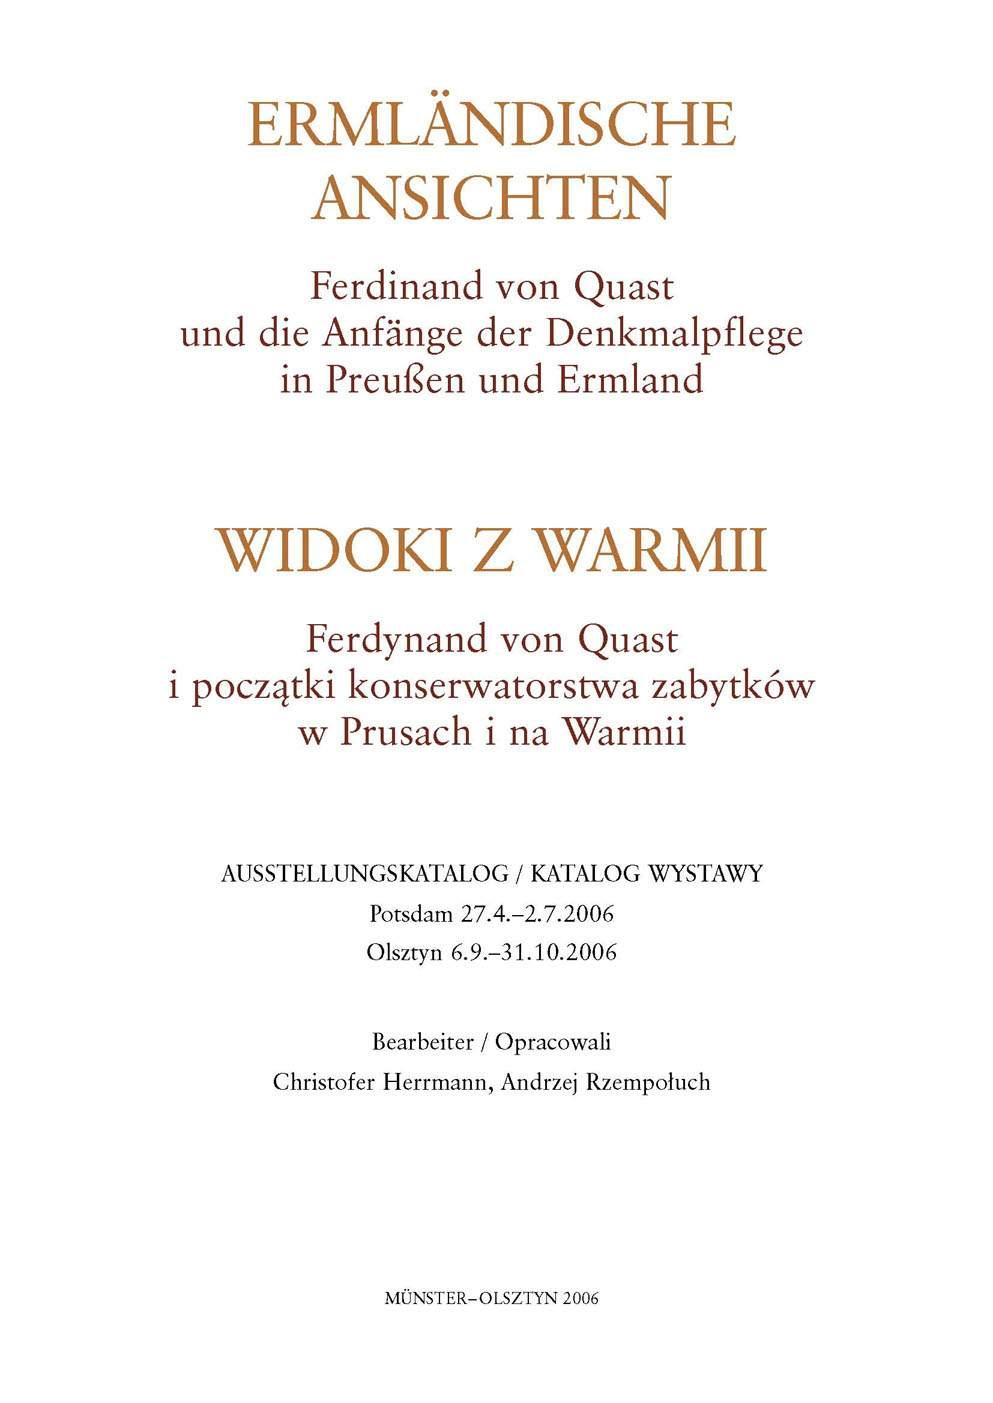 http://m.wmwm.pl/2015/04/orig/z-25-iv-08-quast-tytulowa-4181.jpg